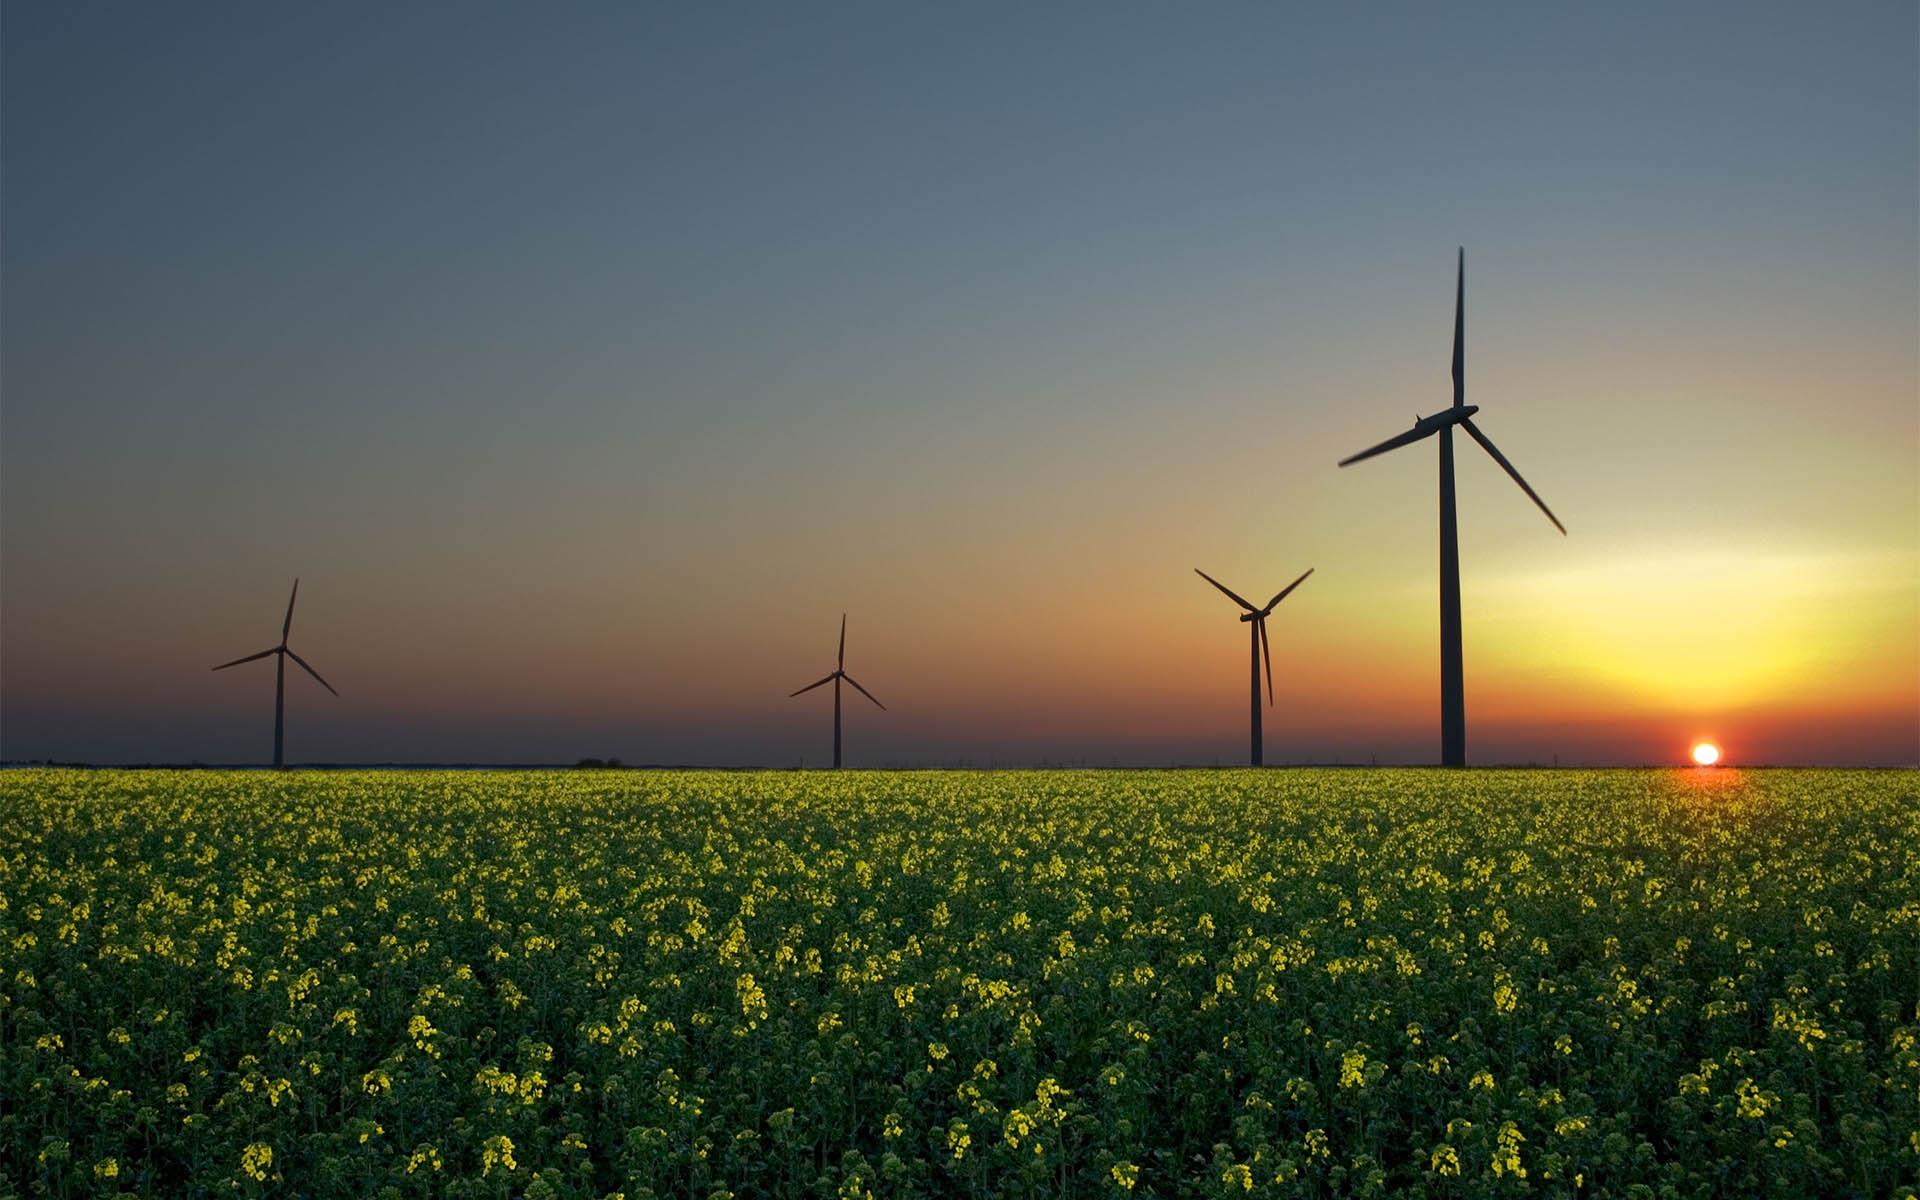 Blockchain-Powered Green Energy Startup WePower Announces Platform Launch and Fundraiser